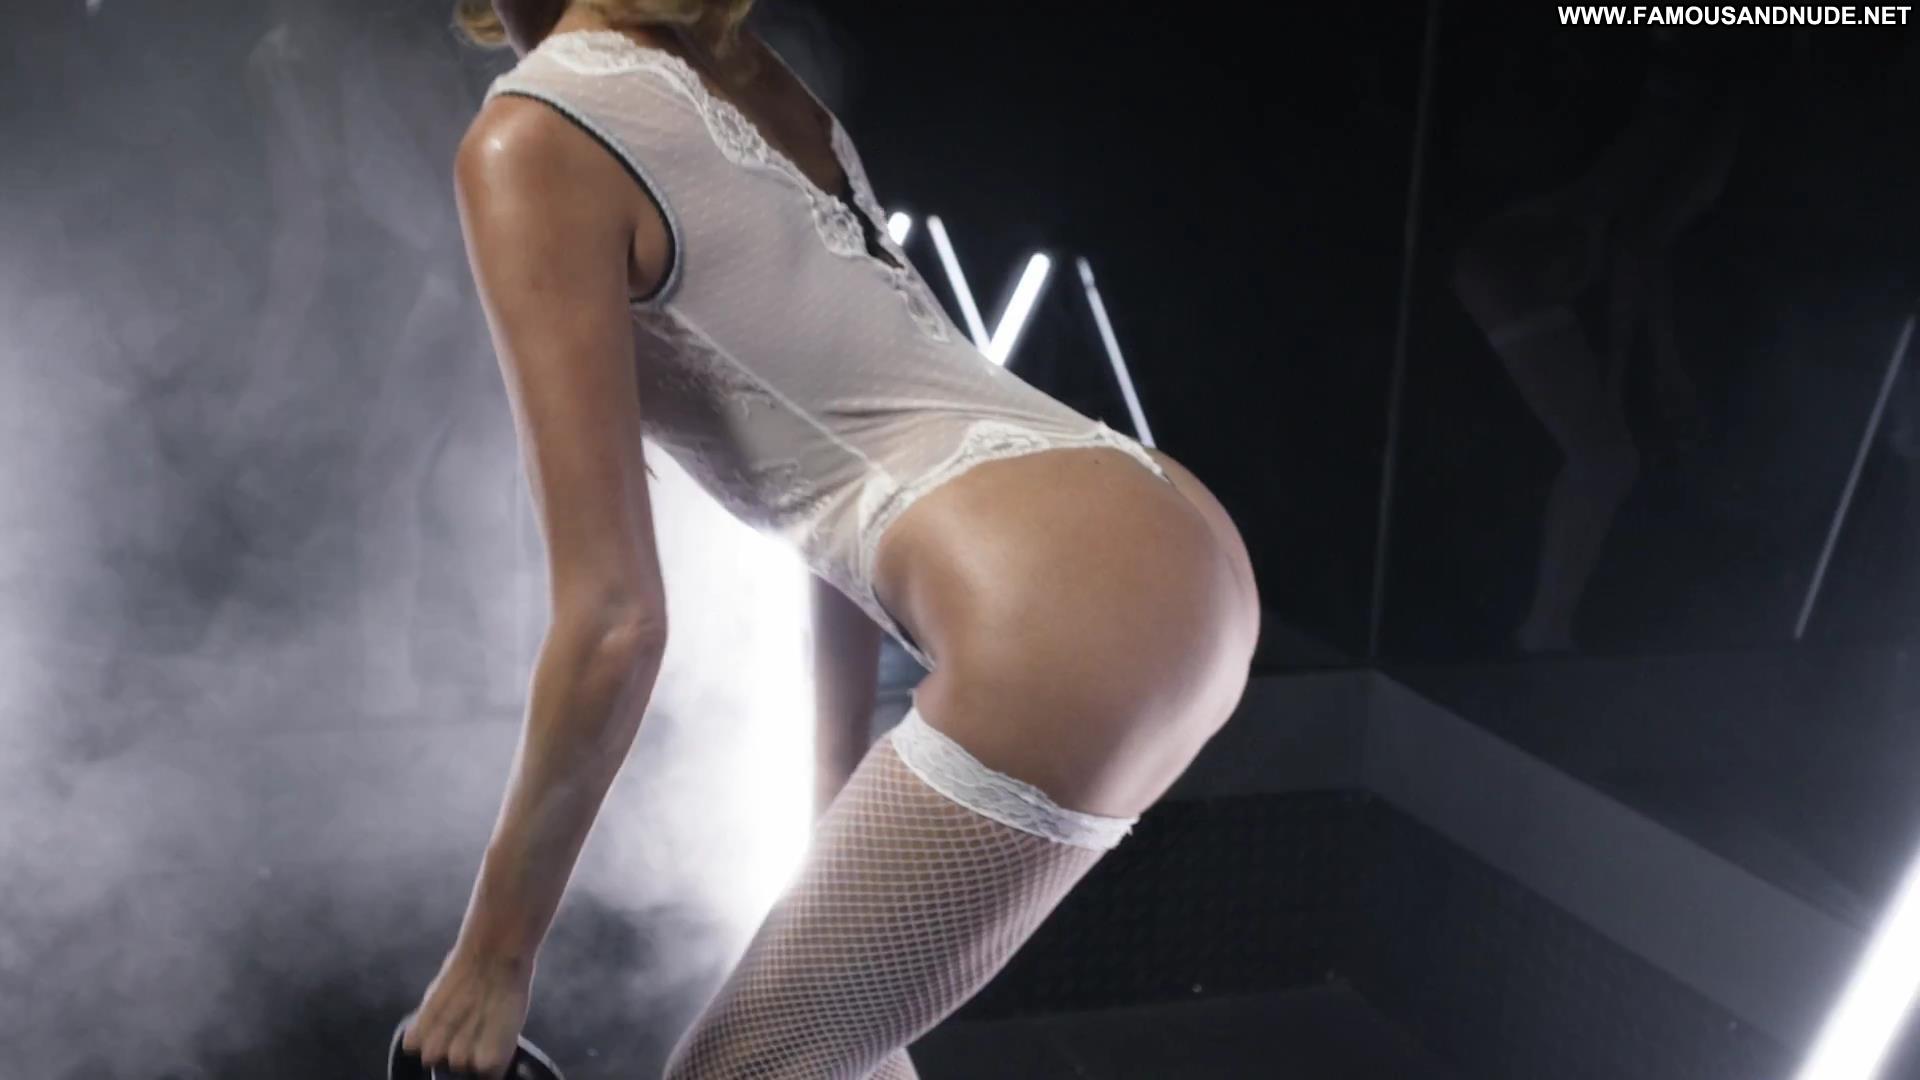 Allison Parker Model Sex Porn Video allison parker k sex k sex celebrity beautiful babe posing